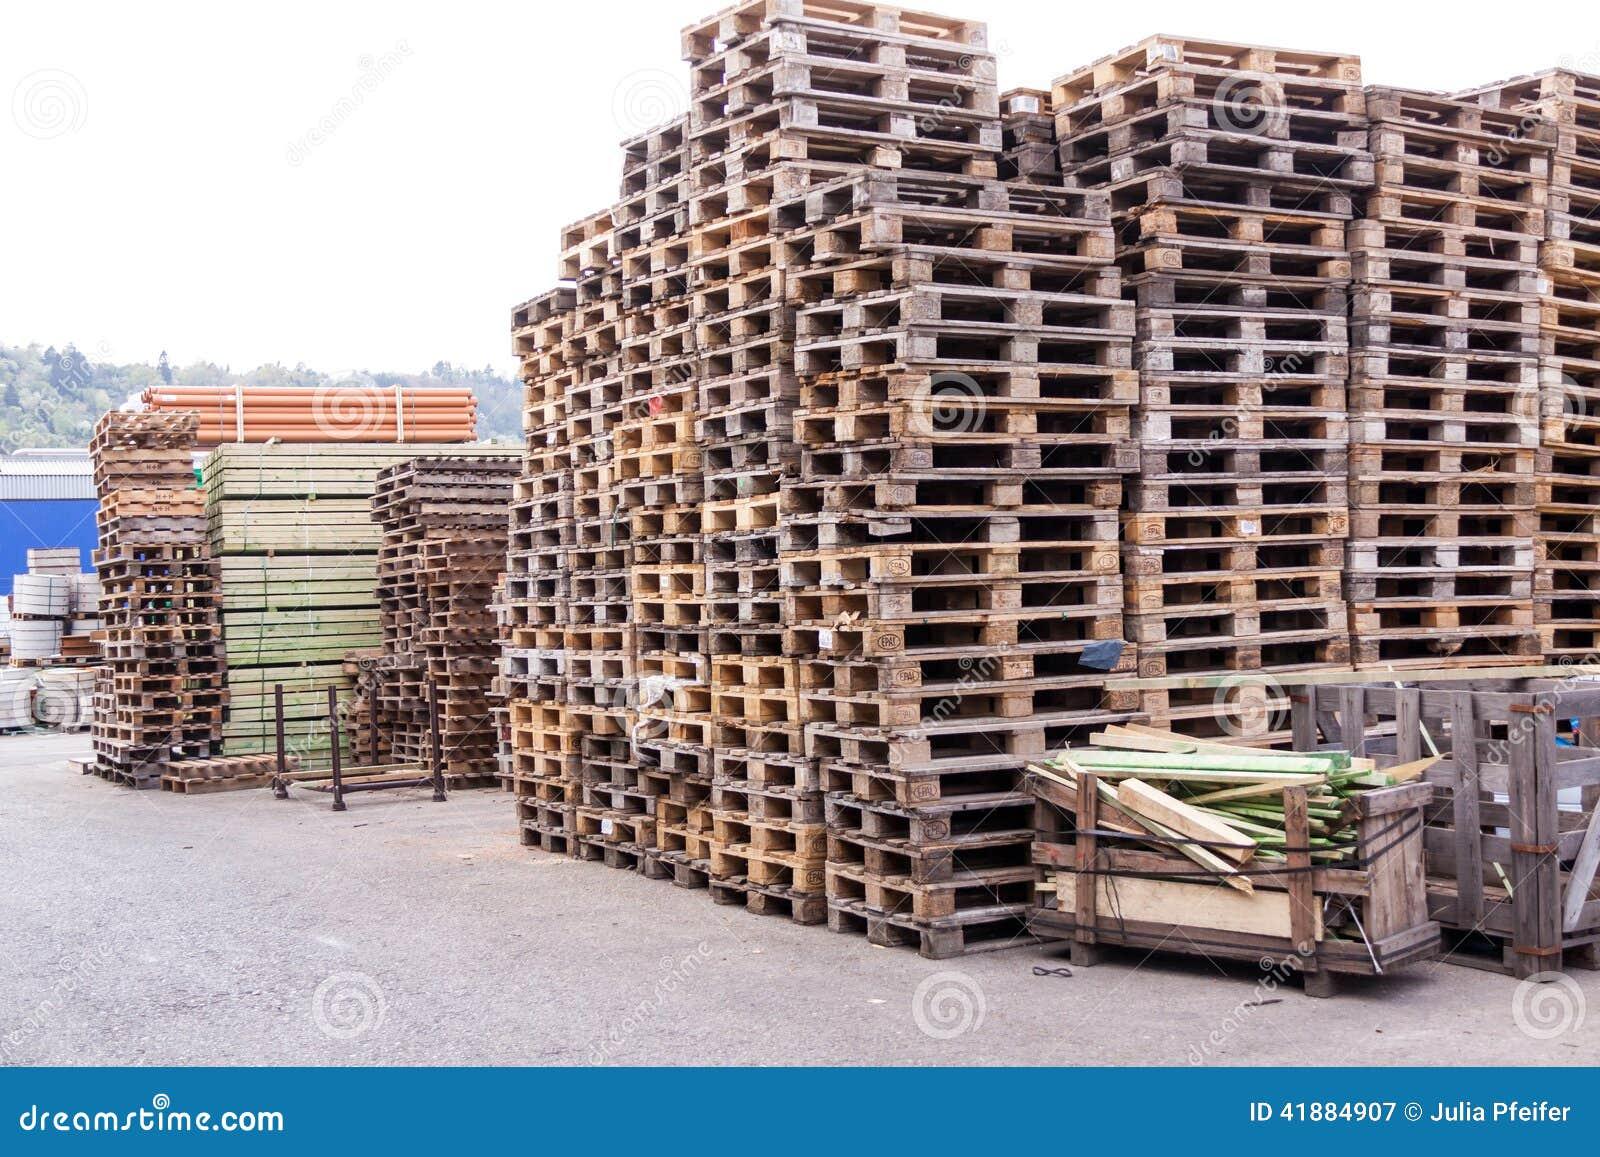 Stapels oude houten pallets in een werf stock foto afbeelding 41884907 - Foto houten pallet ...